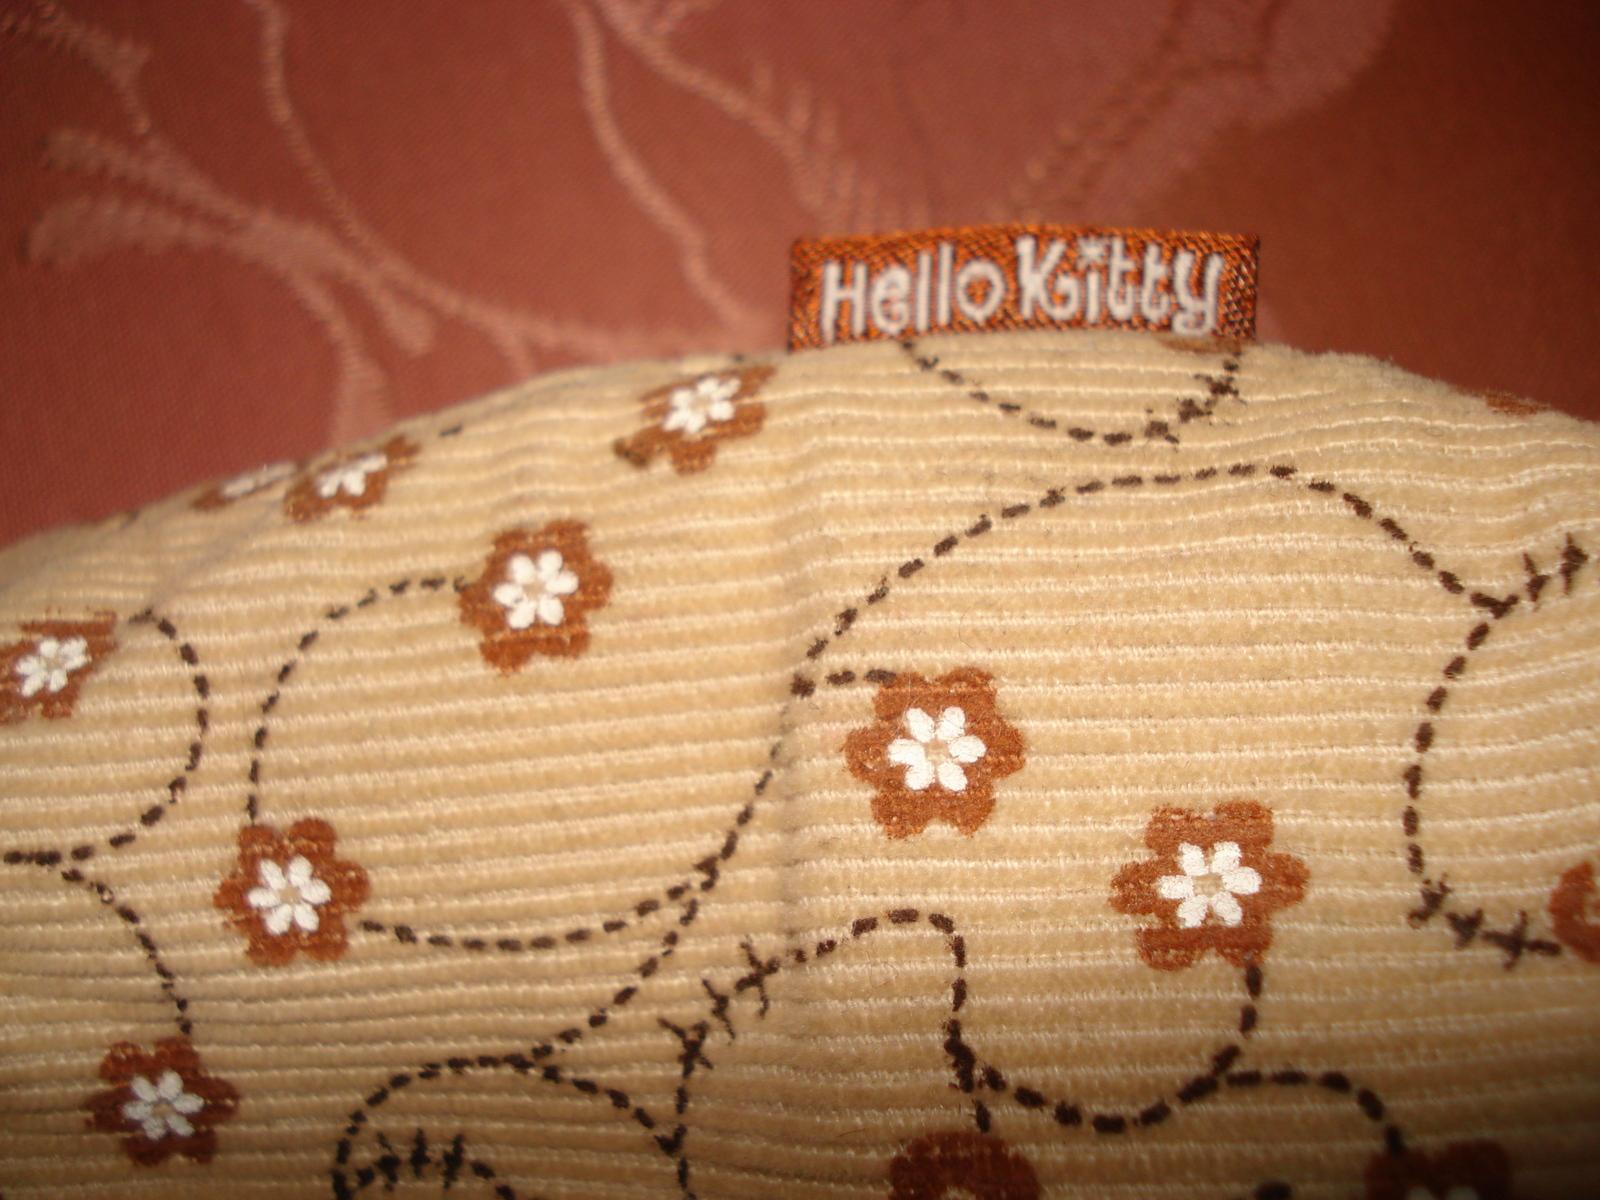 SANRIO HELLO KITTY TAN BEIGE FABRIC CORDUROY COTTON HANDBAG PURSE 2008